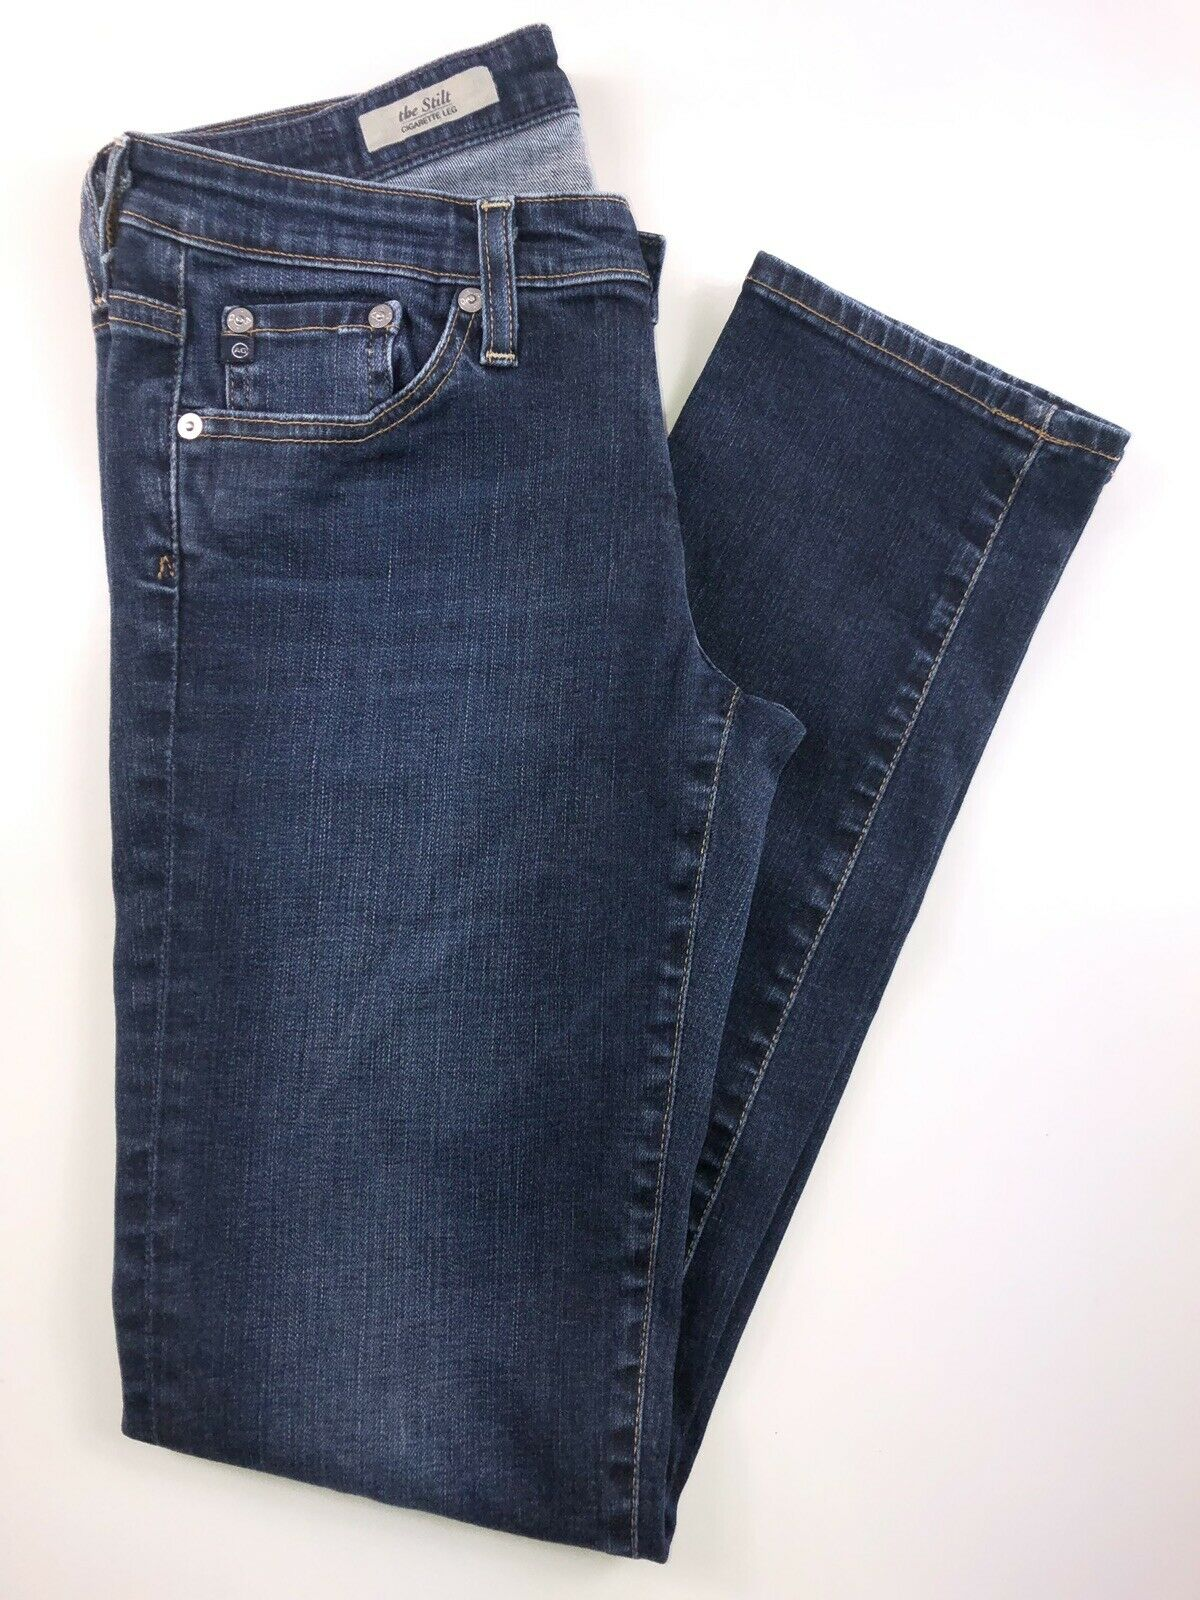 Adriano goldschmied Stilt CIgarette Leg Dark Wash Jeans 27R. 27x29x7x11